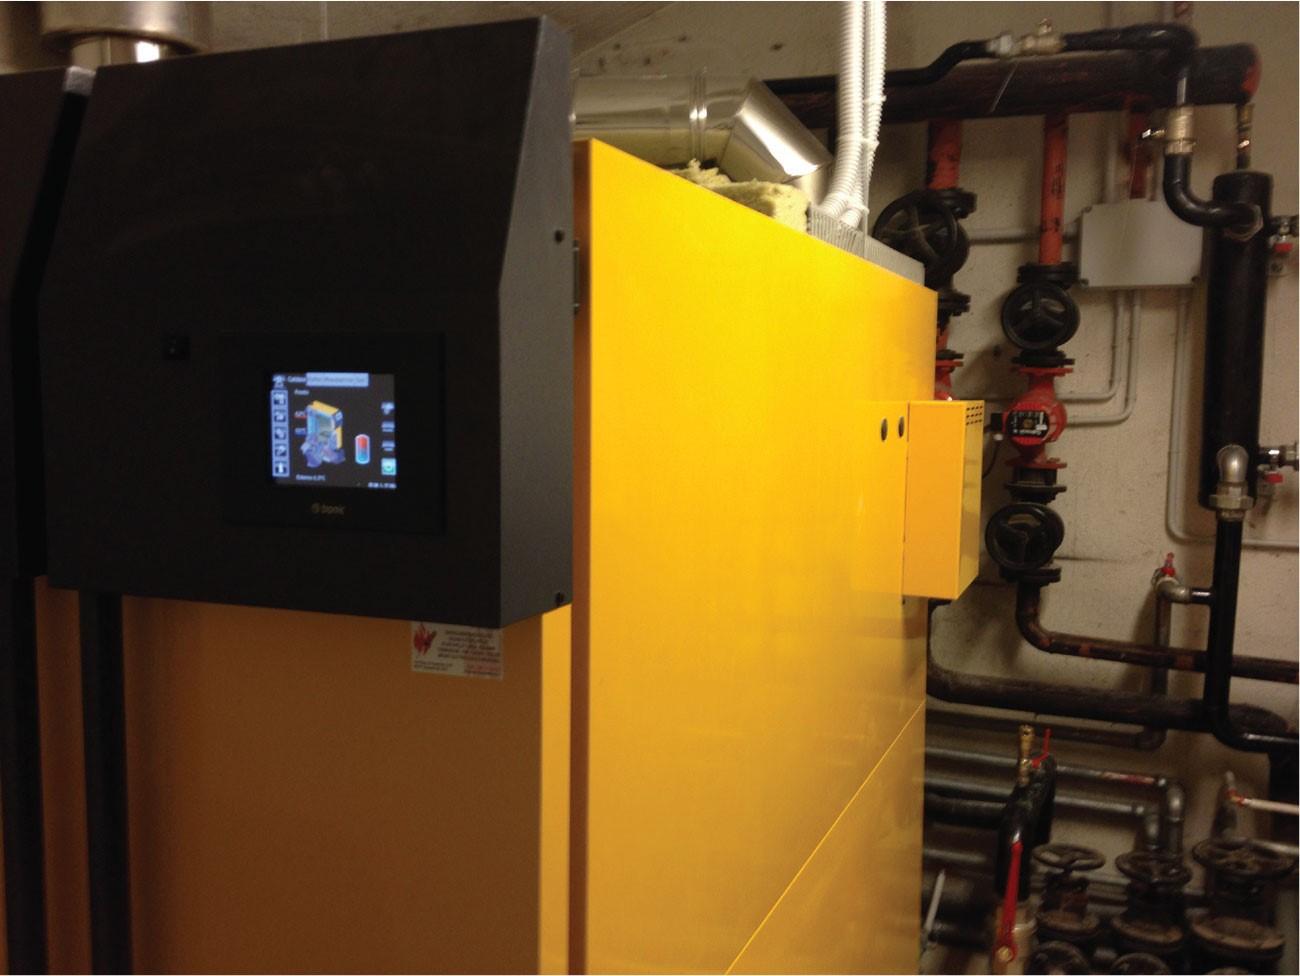 Informazioni e eventi eta caldaie alimentate con biomassa for Eta caldaie legna